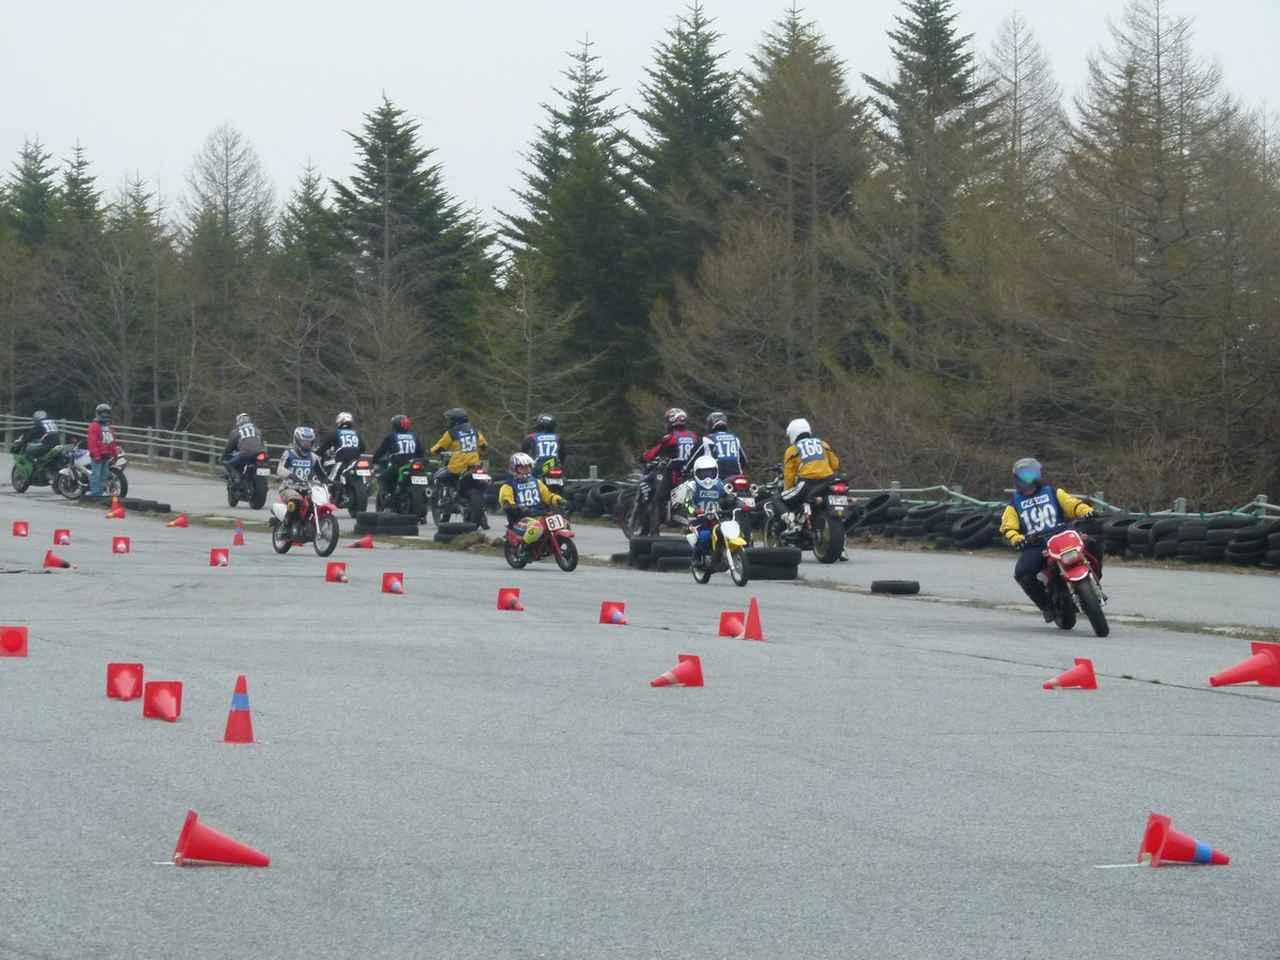 Images : 28番目の画像 - ジムカーナの練習風景 - webオートバイ